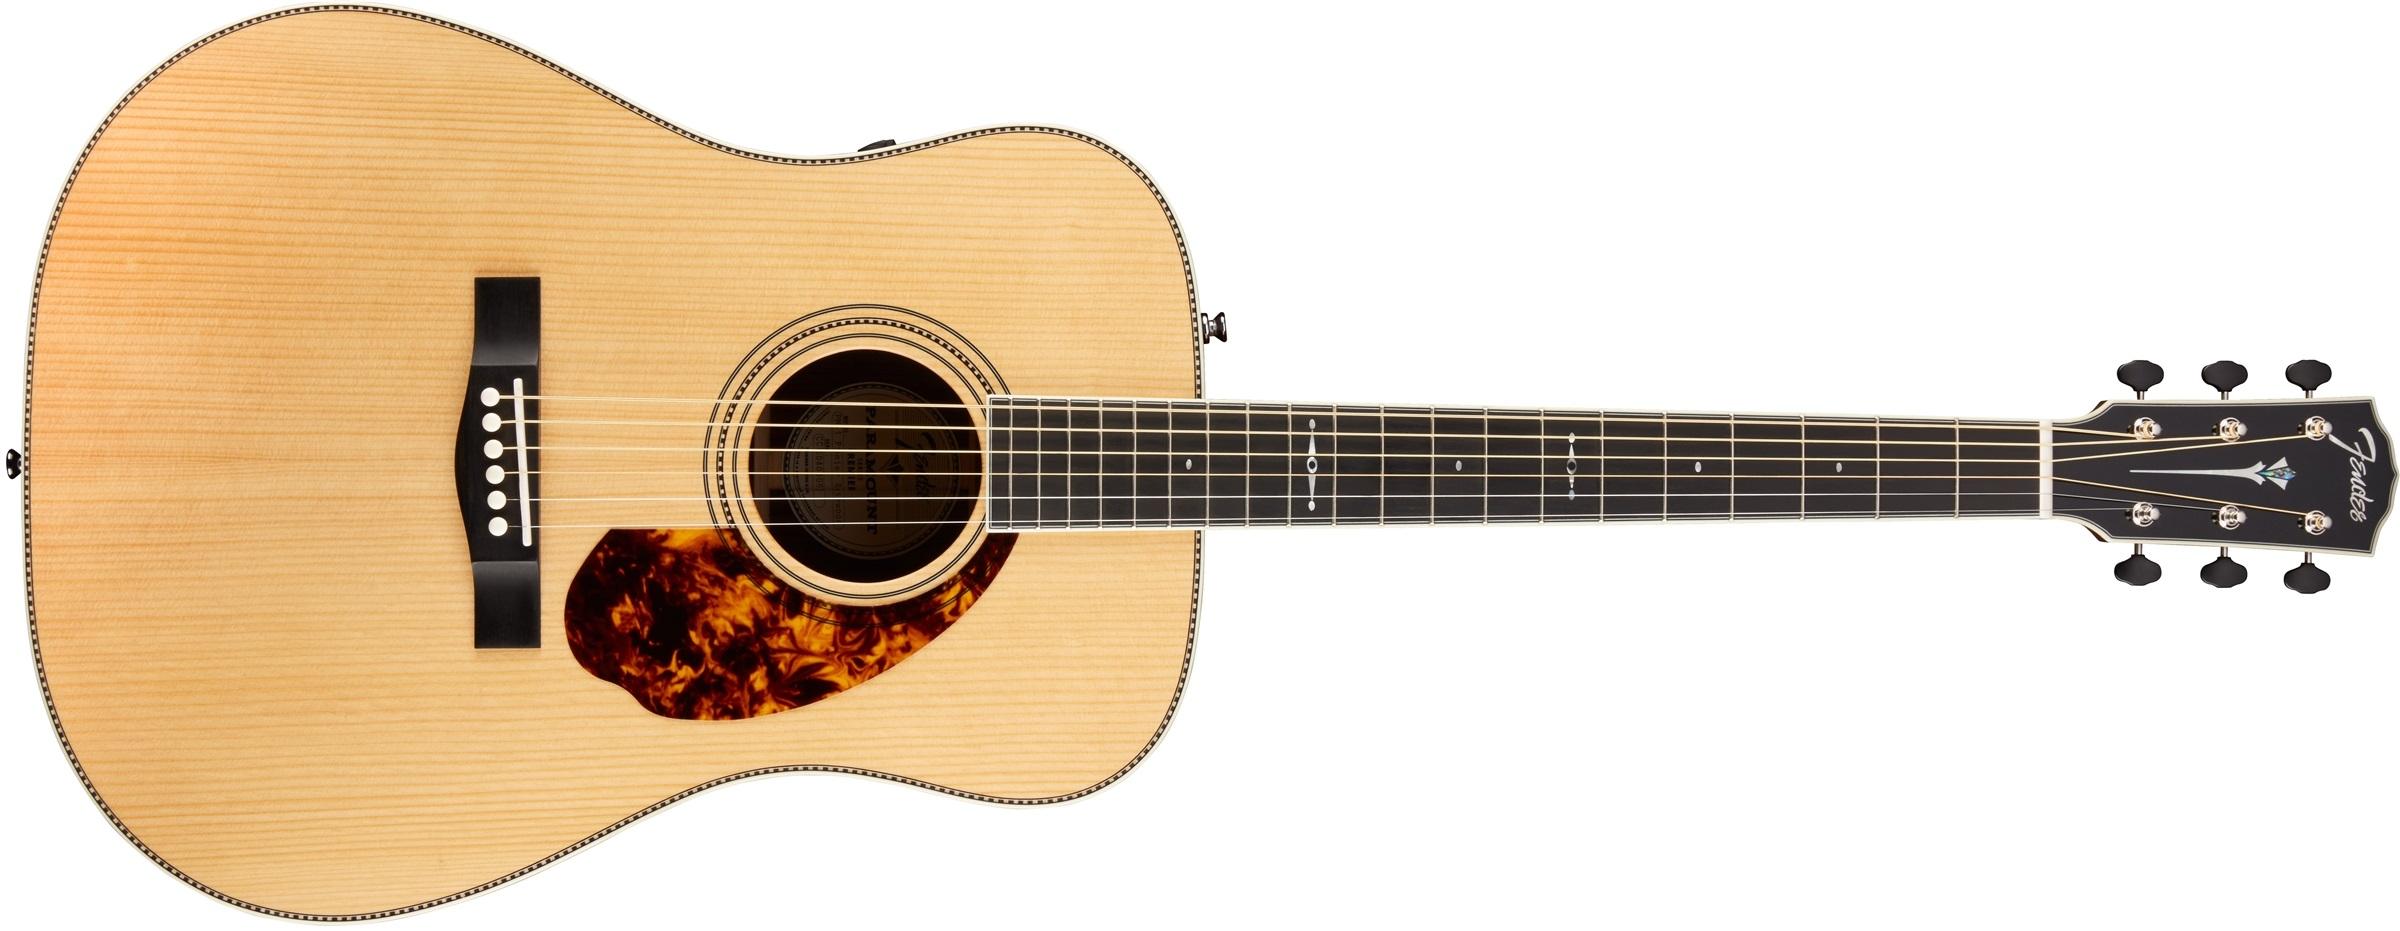 Fender PM-1 Limited Adirondack Rosewood NAT